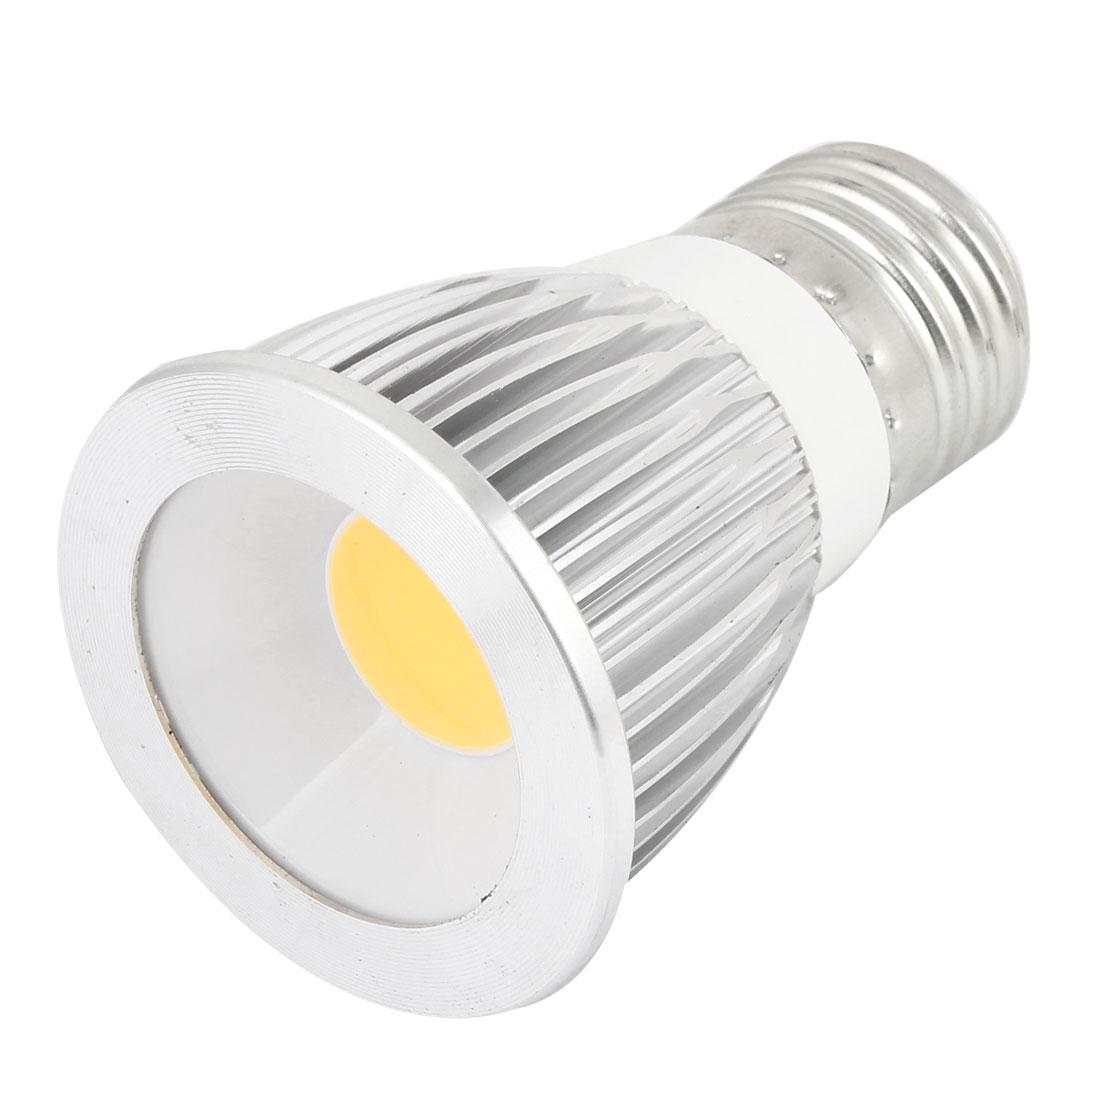 AC 85-265V 9W E27 Non-dimmable Warm White Light COB LED Downlight Spotlight